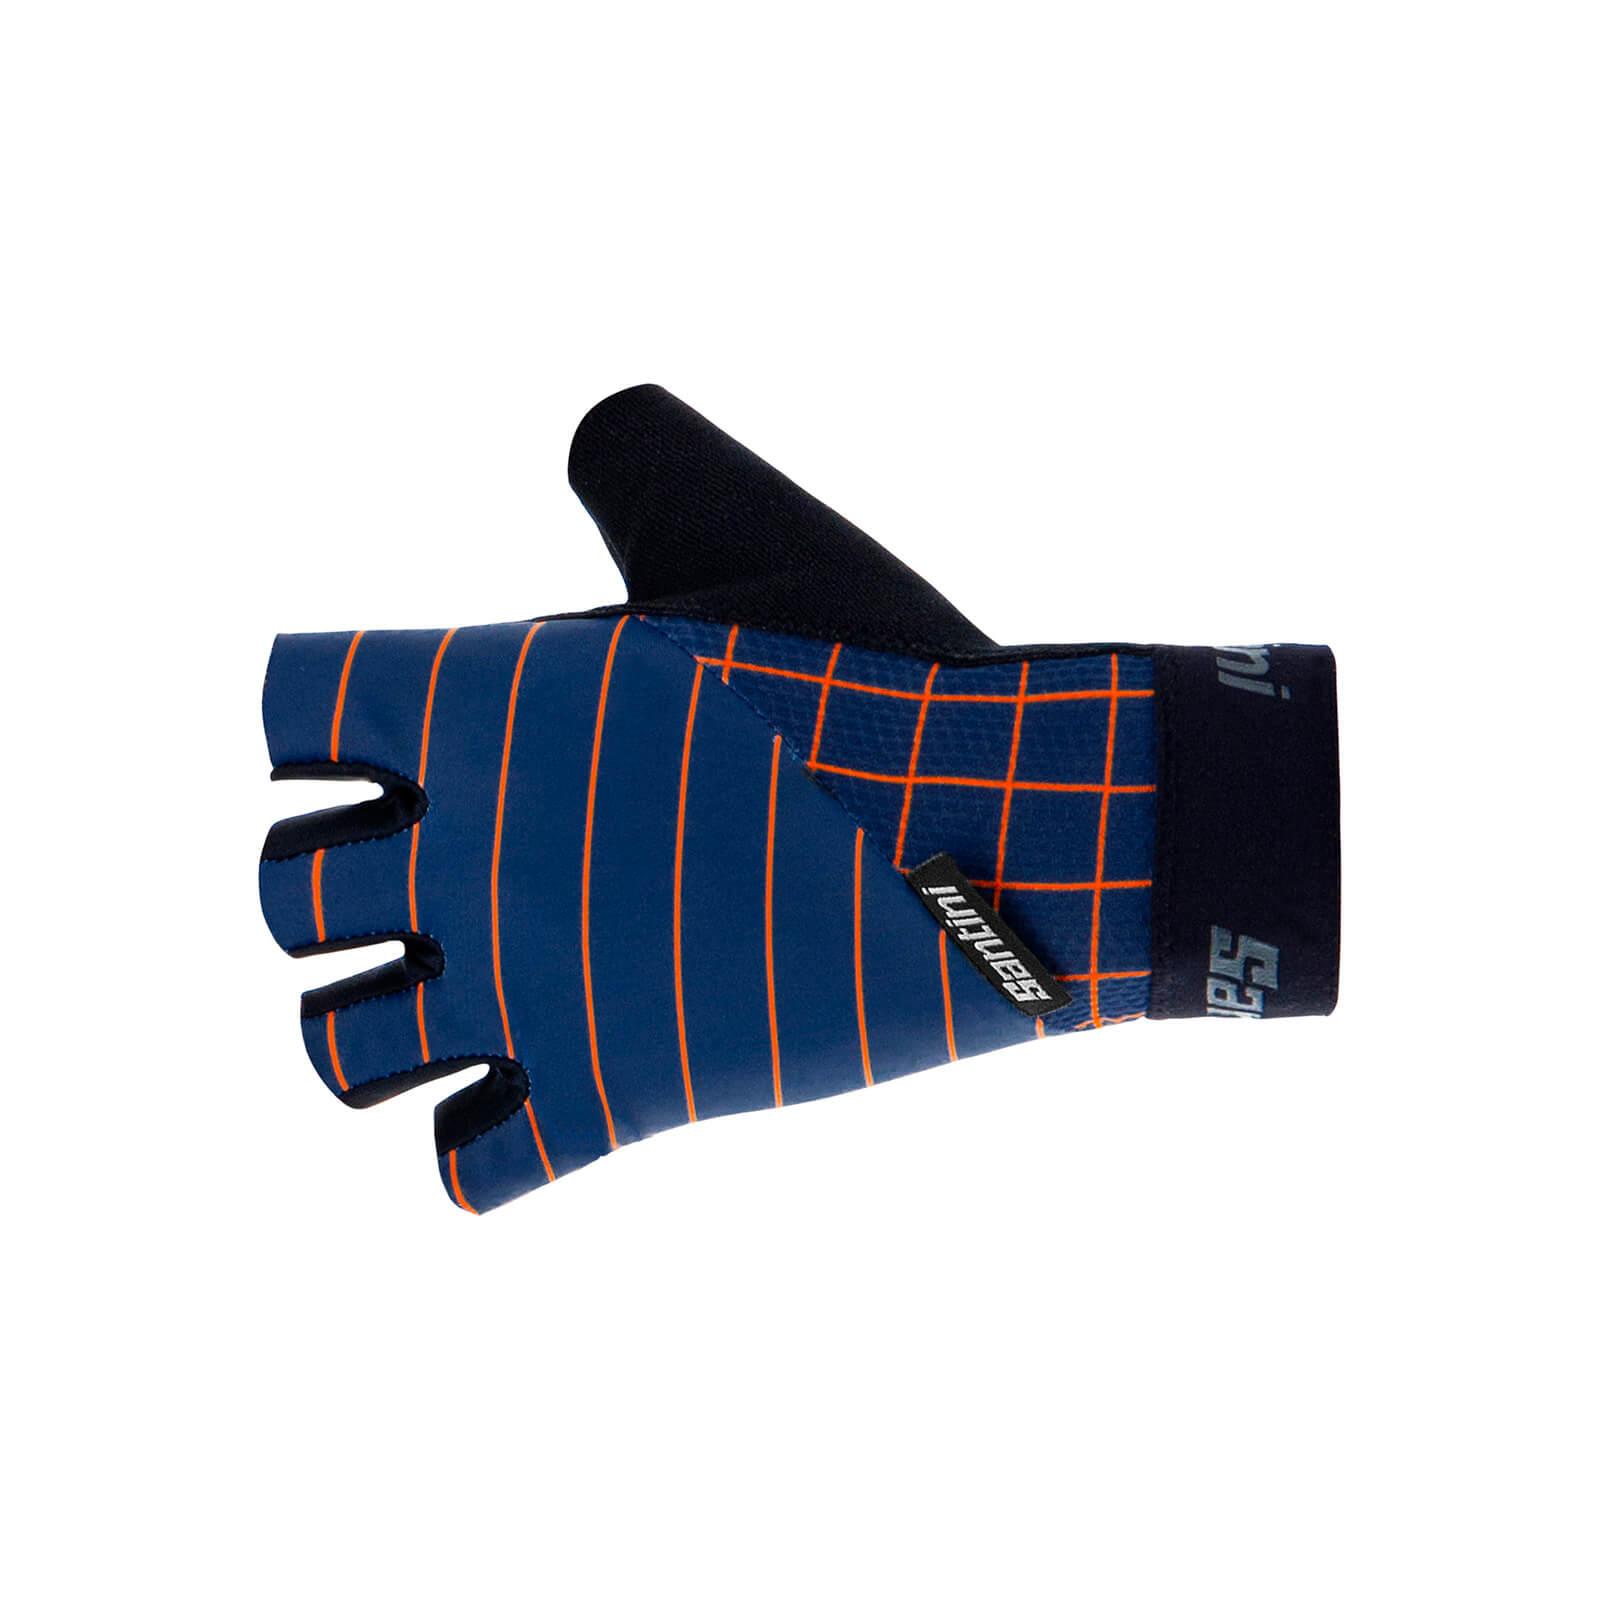 Santini Dinamo Gel Gloves - M - Nautica Blue